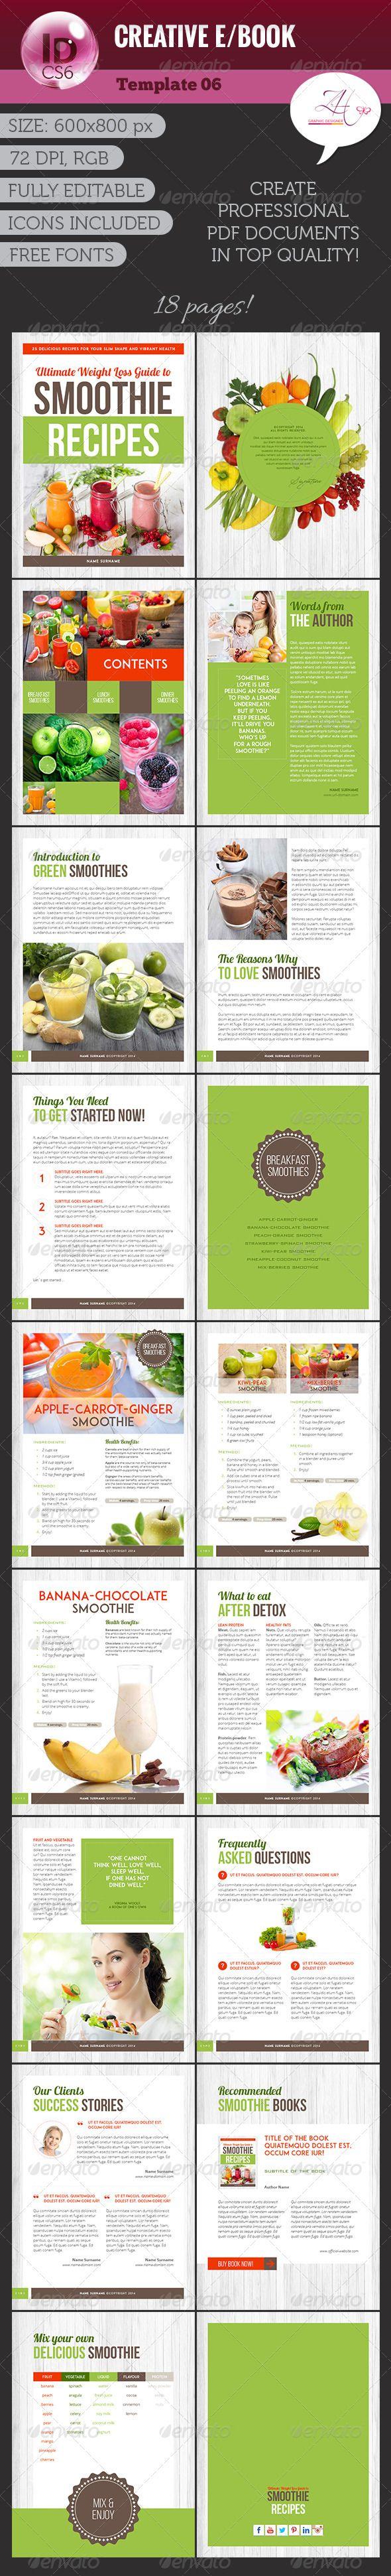 Creative eBook Template #ebook #design Download: http://graphicriver ...